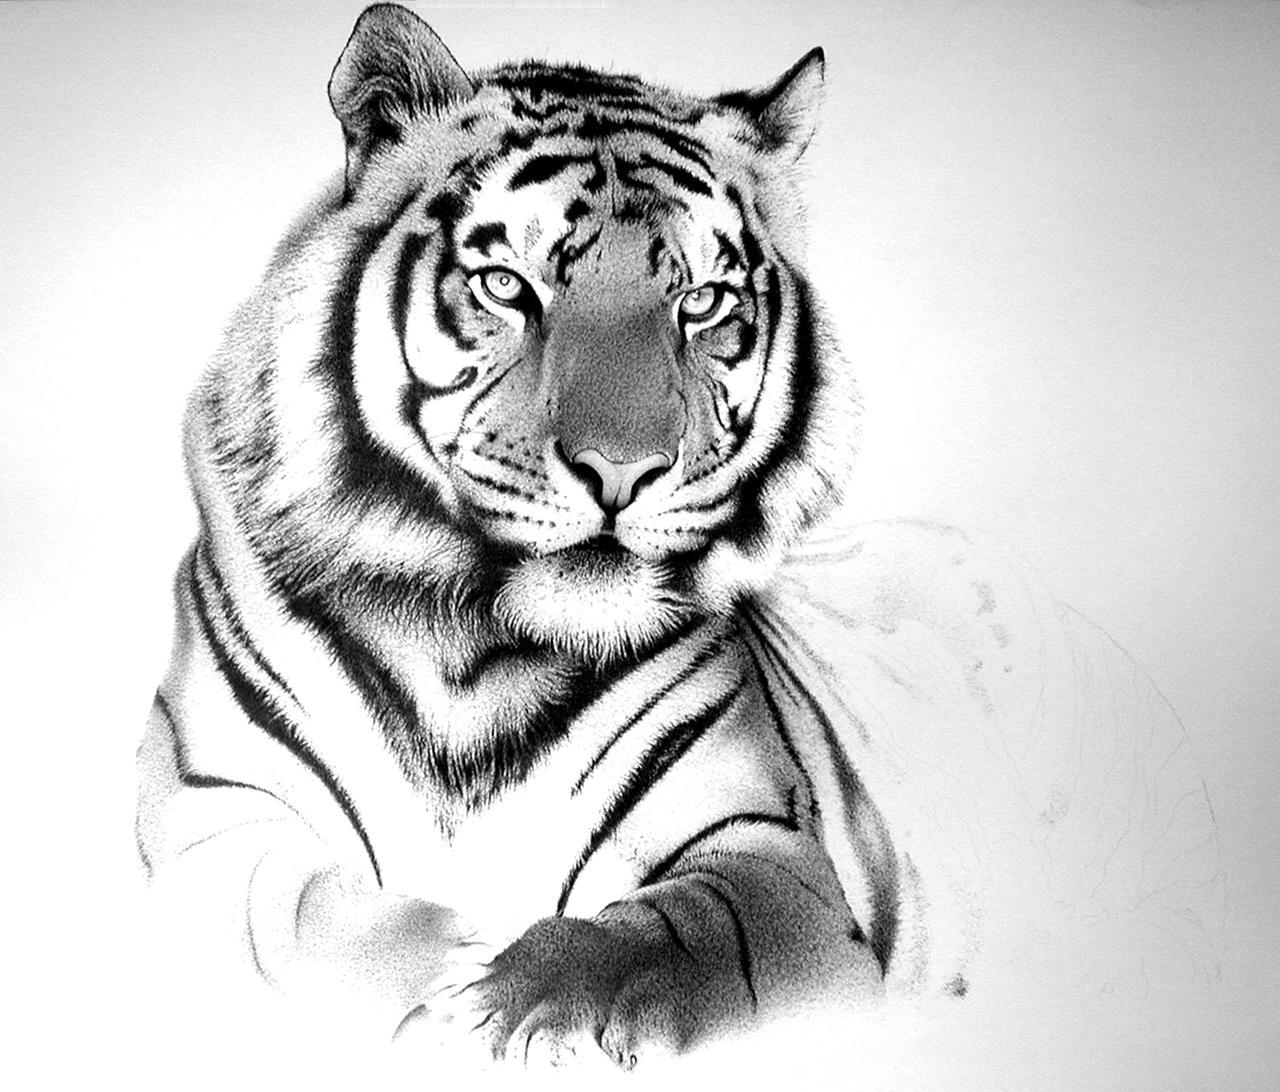 Tiger big by amraa on DeviantArt